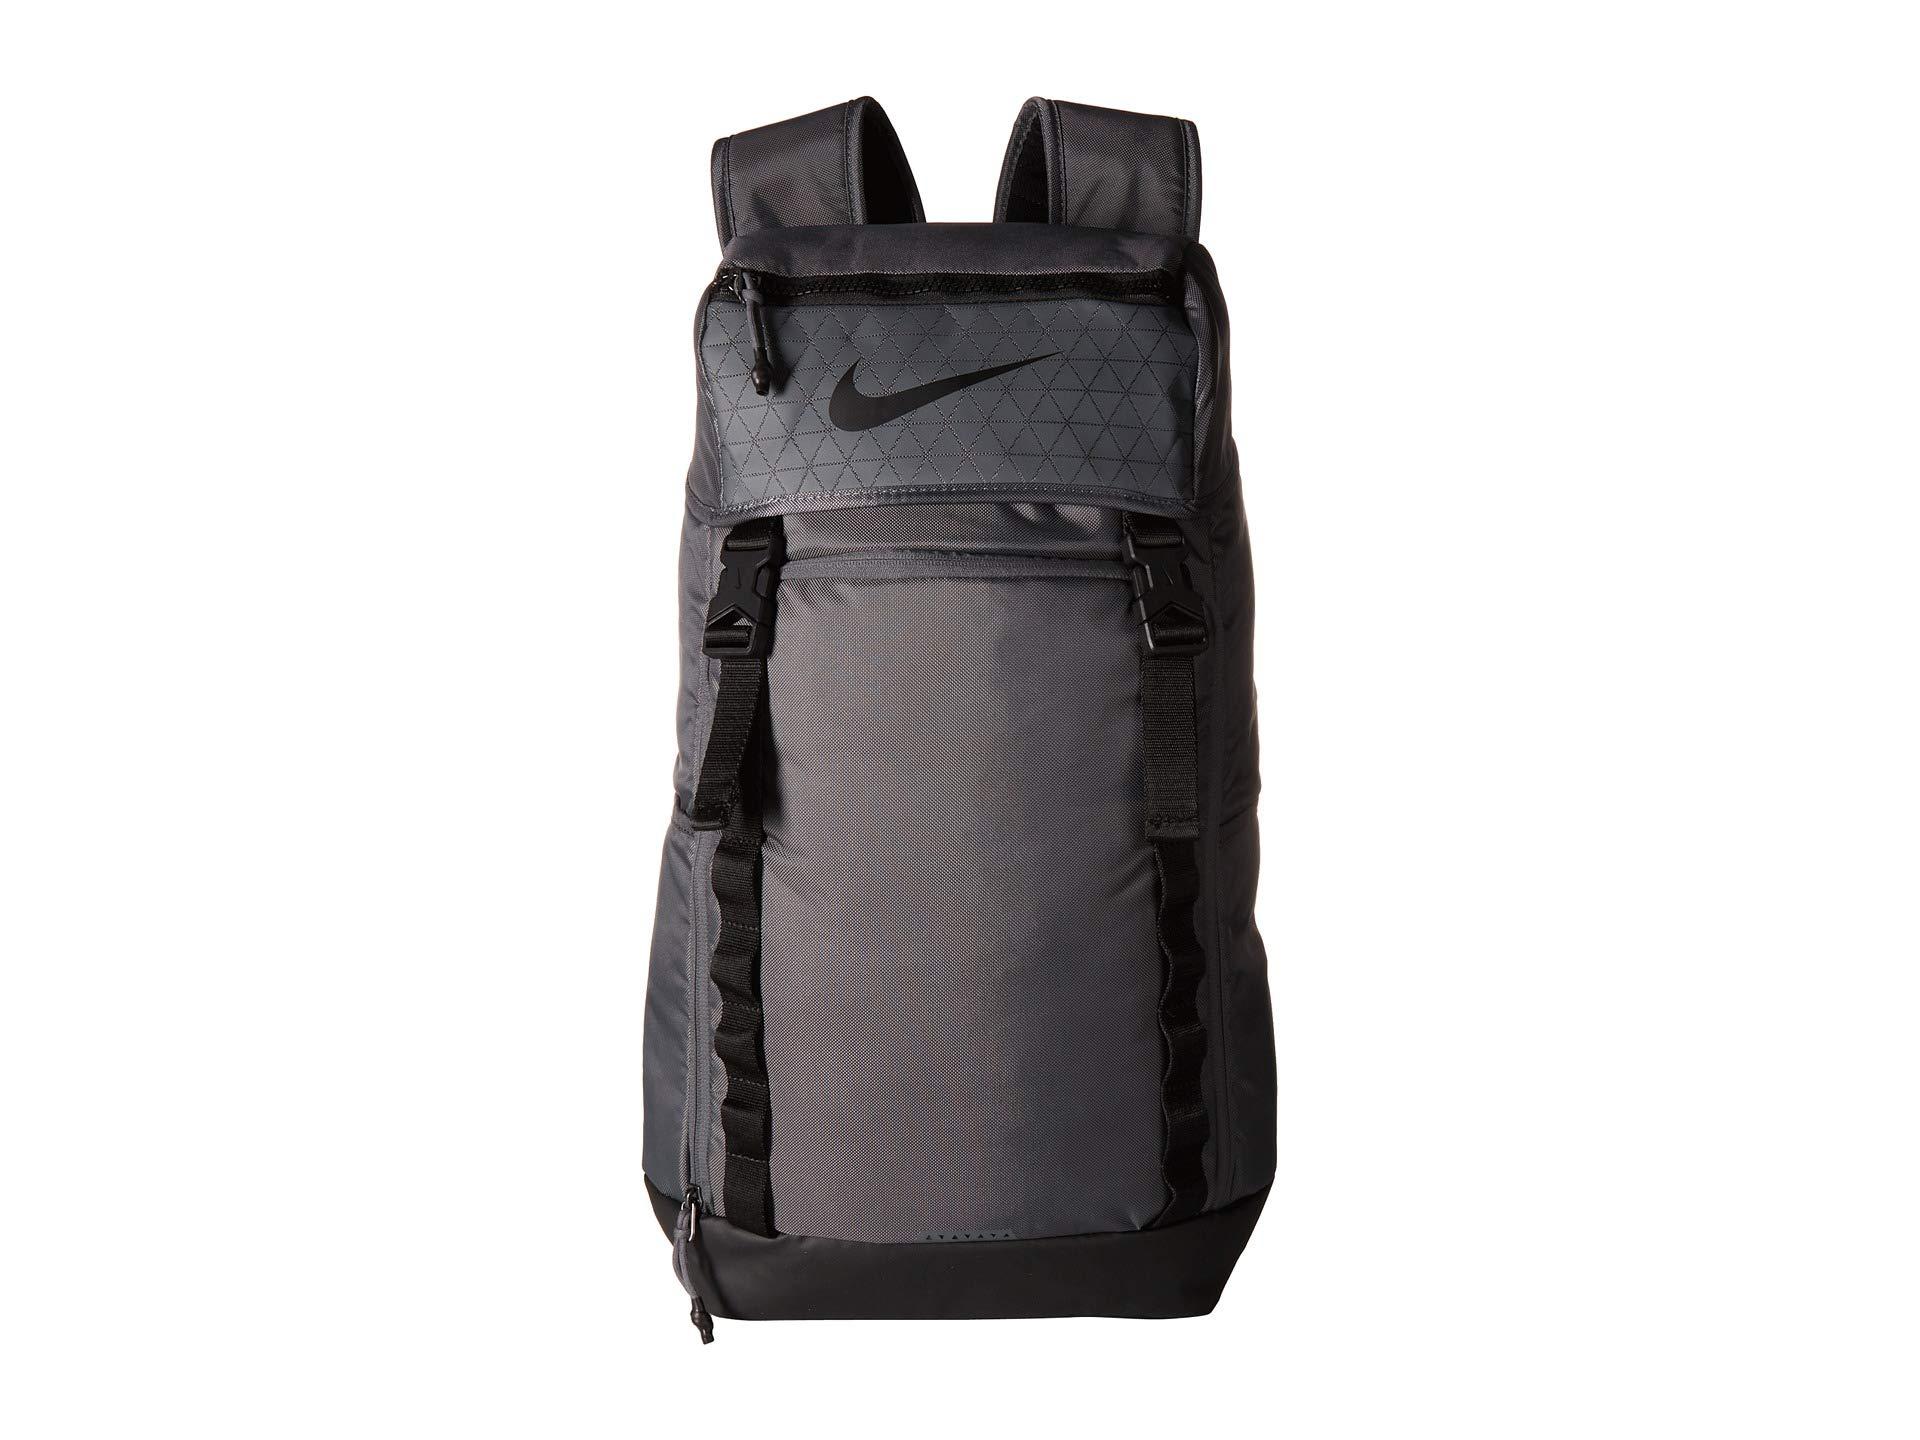 0 Backpack Dark black Nike black Grey Speed 2 Vapor 4EBRqI